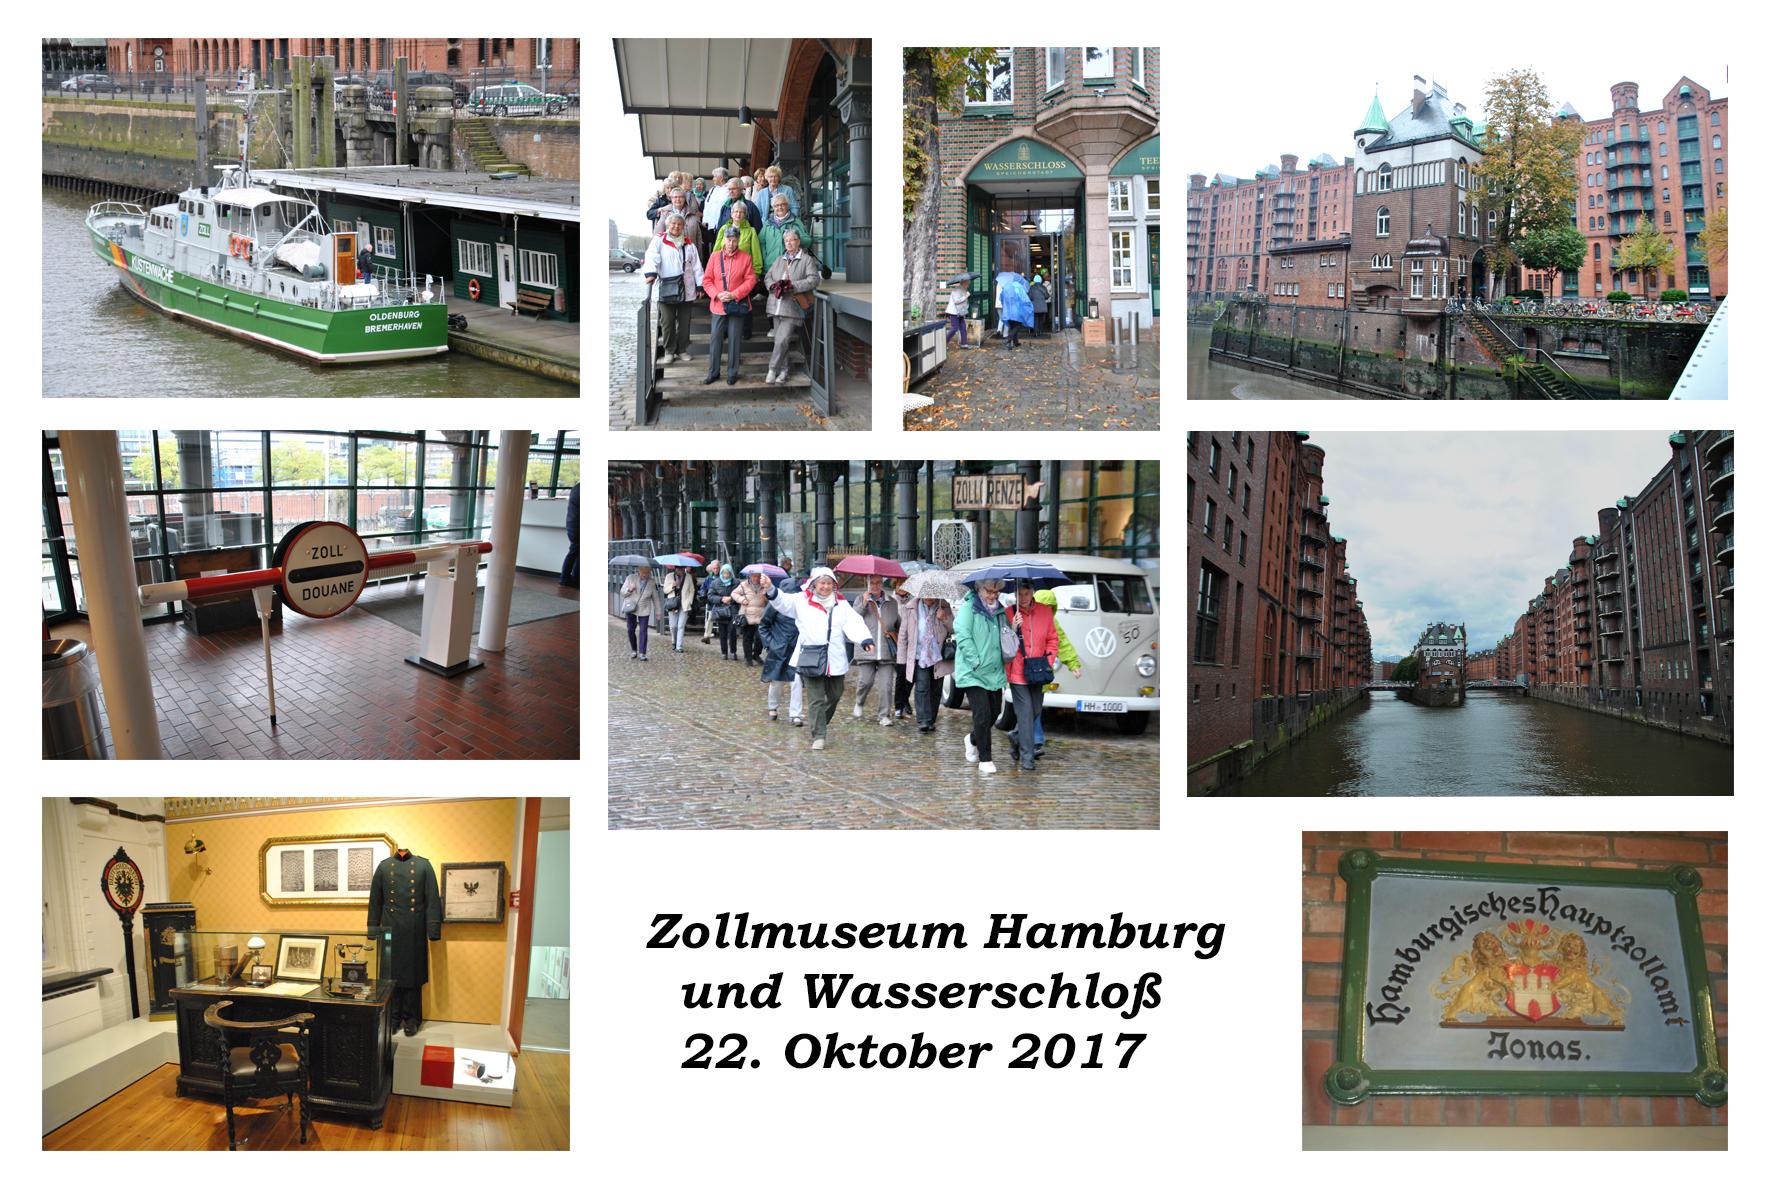 NeNo/Glashütte 2: Zollmuseum, 22.10.2017 (Fotos: Tom)